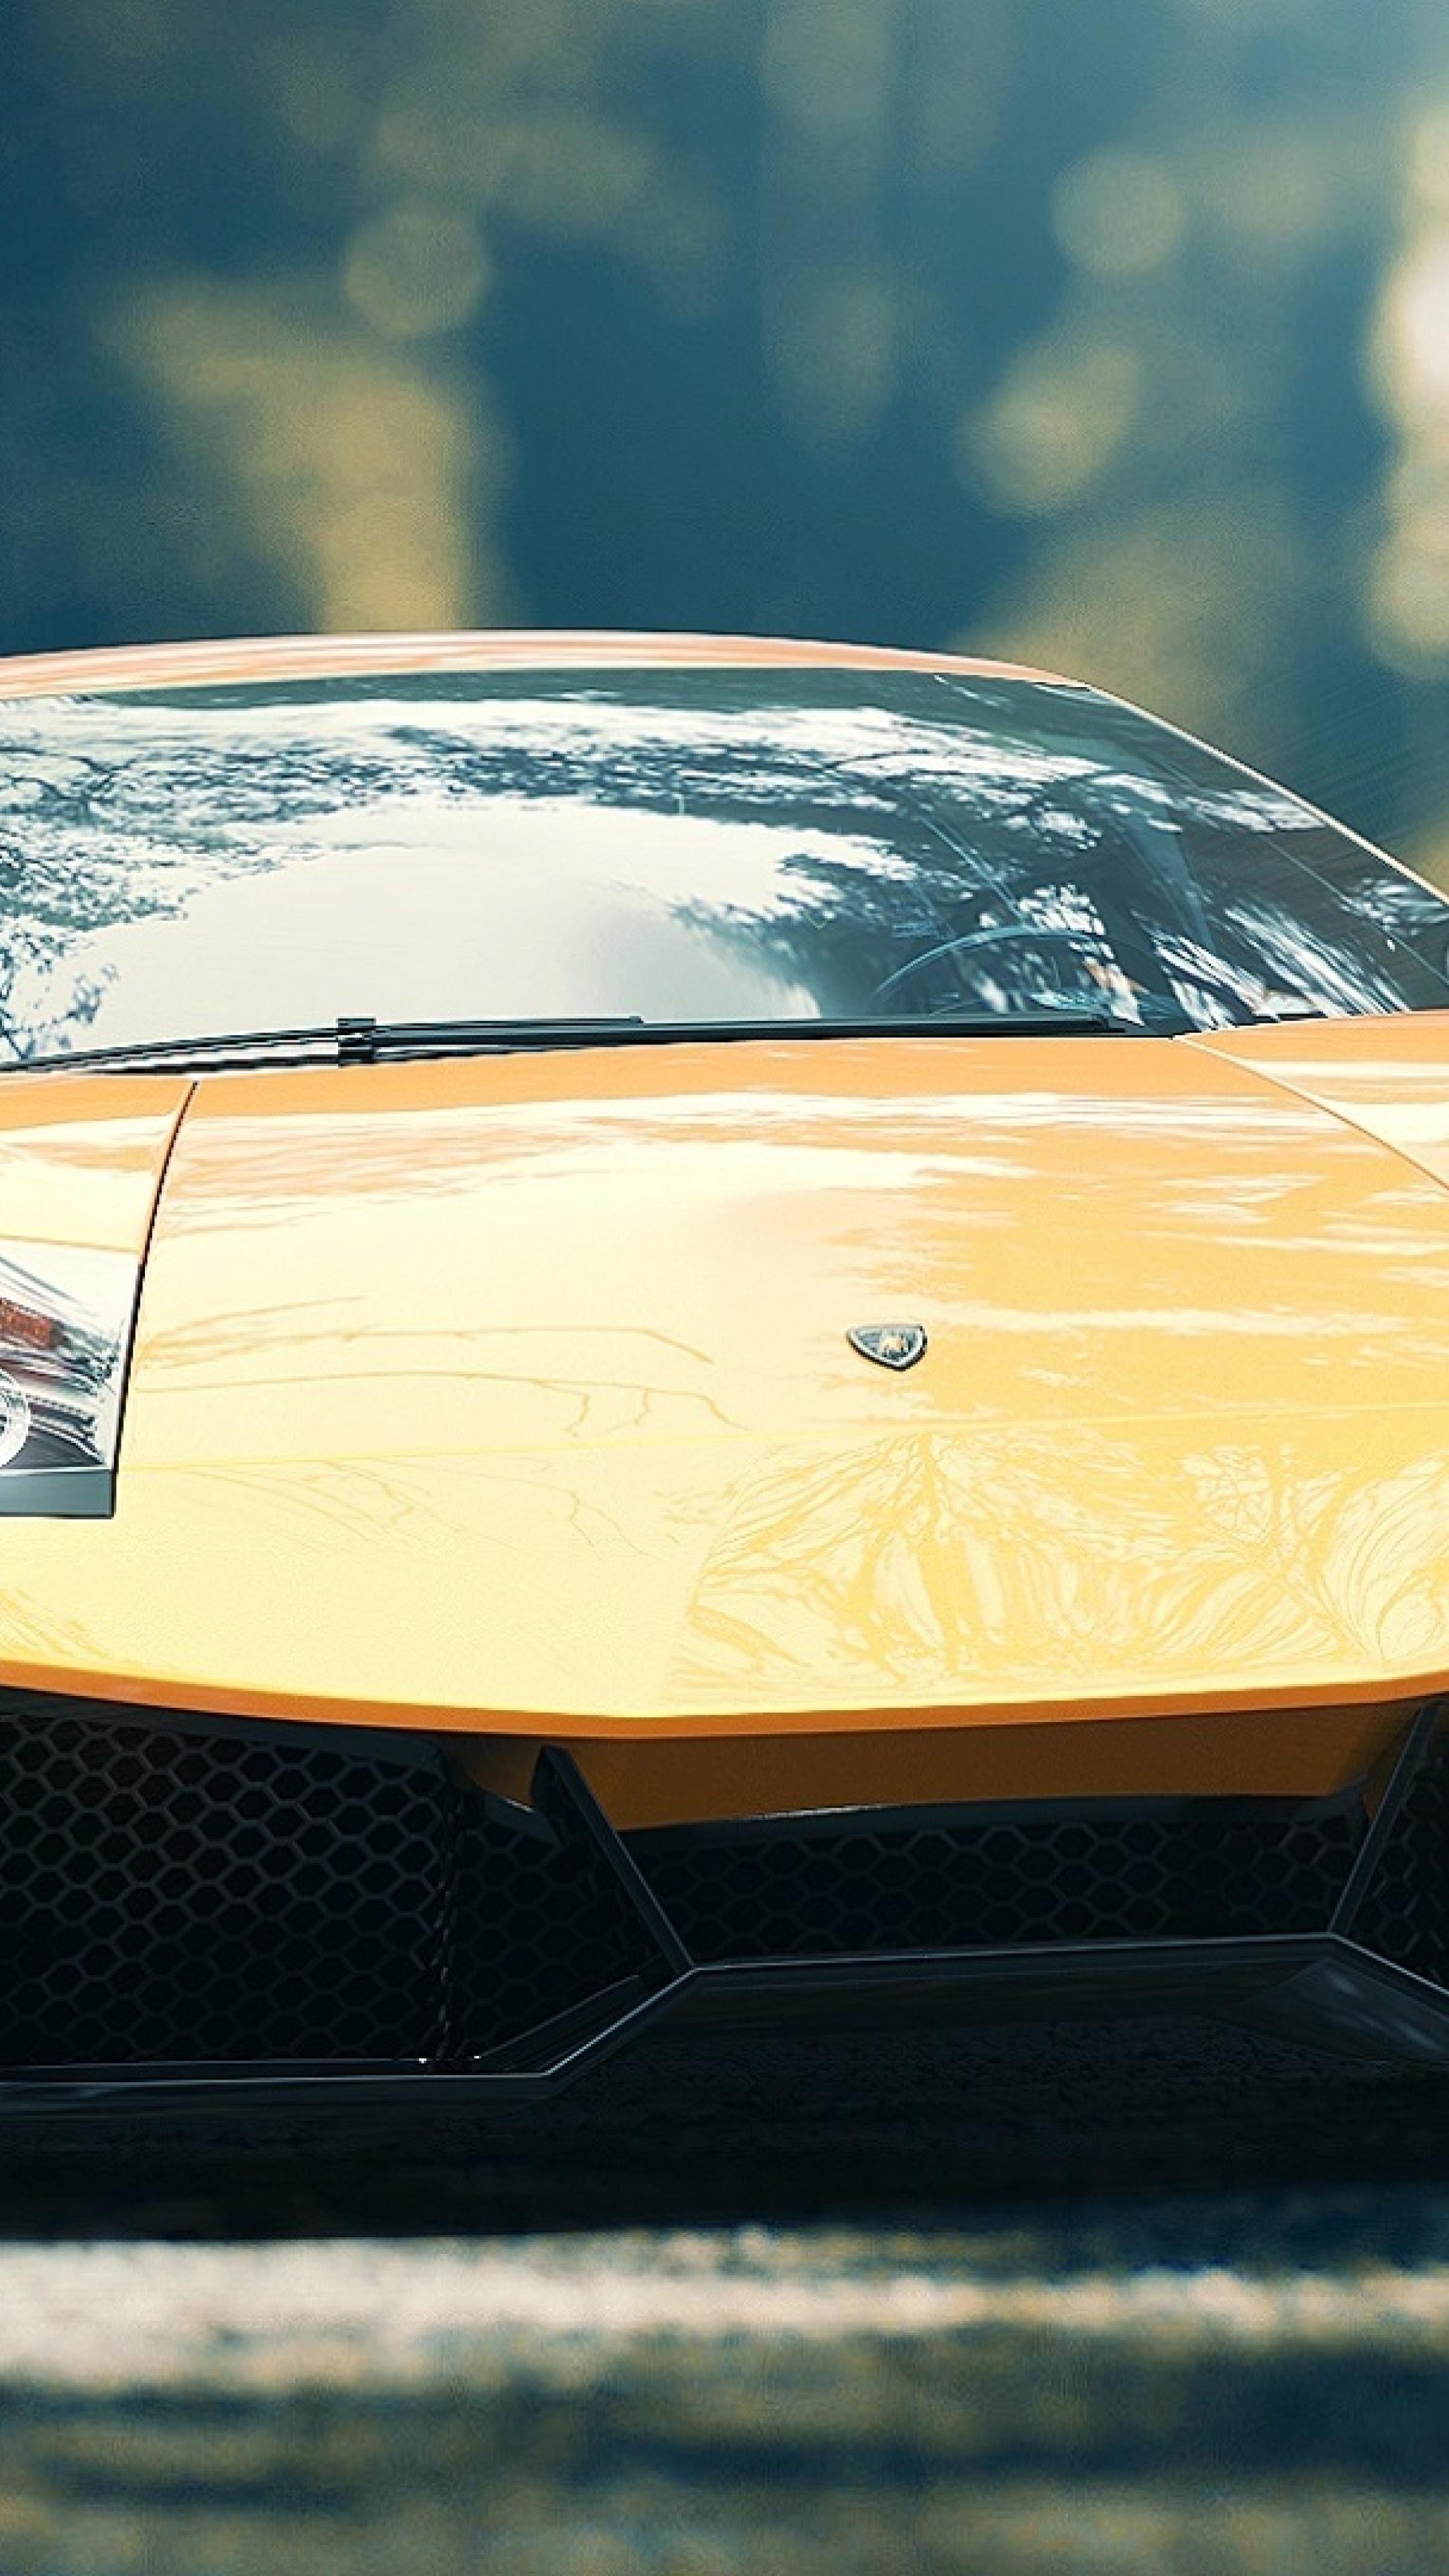 Lamborghini Murcielago lp SV wallpaper cars Wallpaper